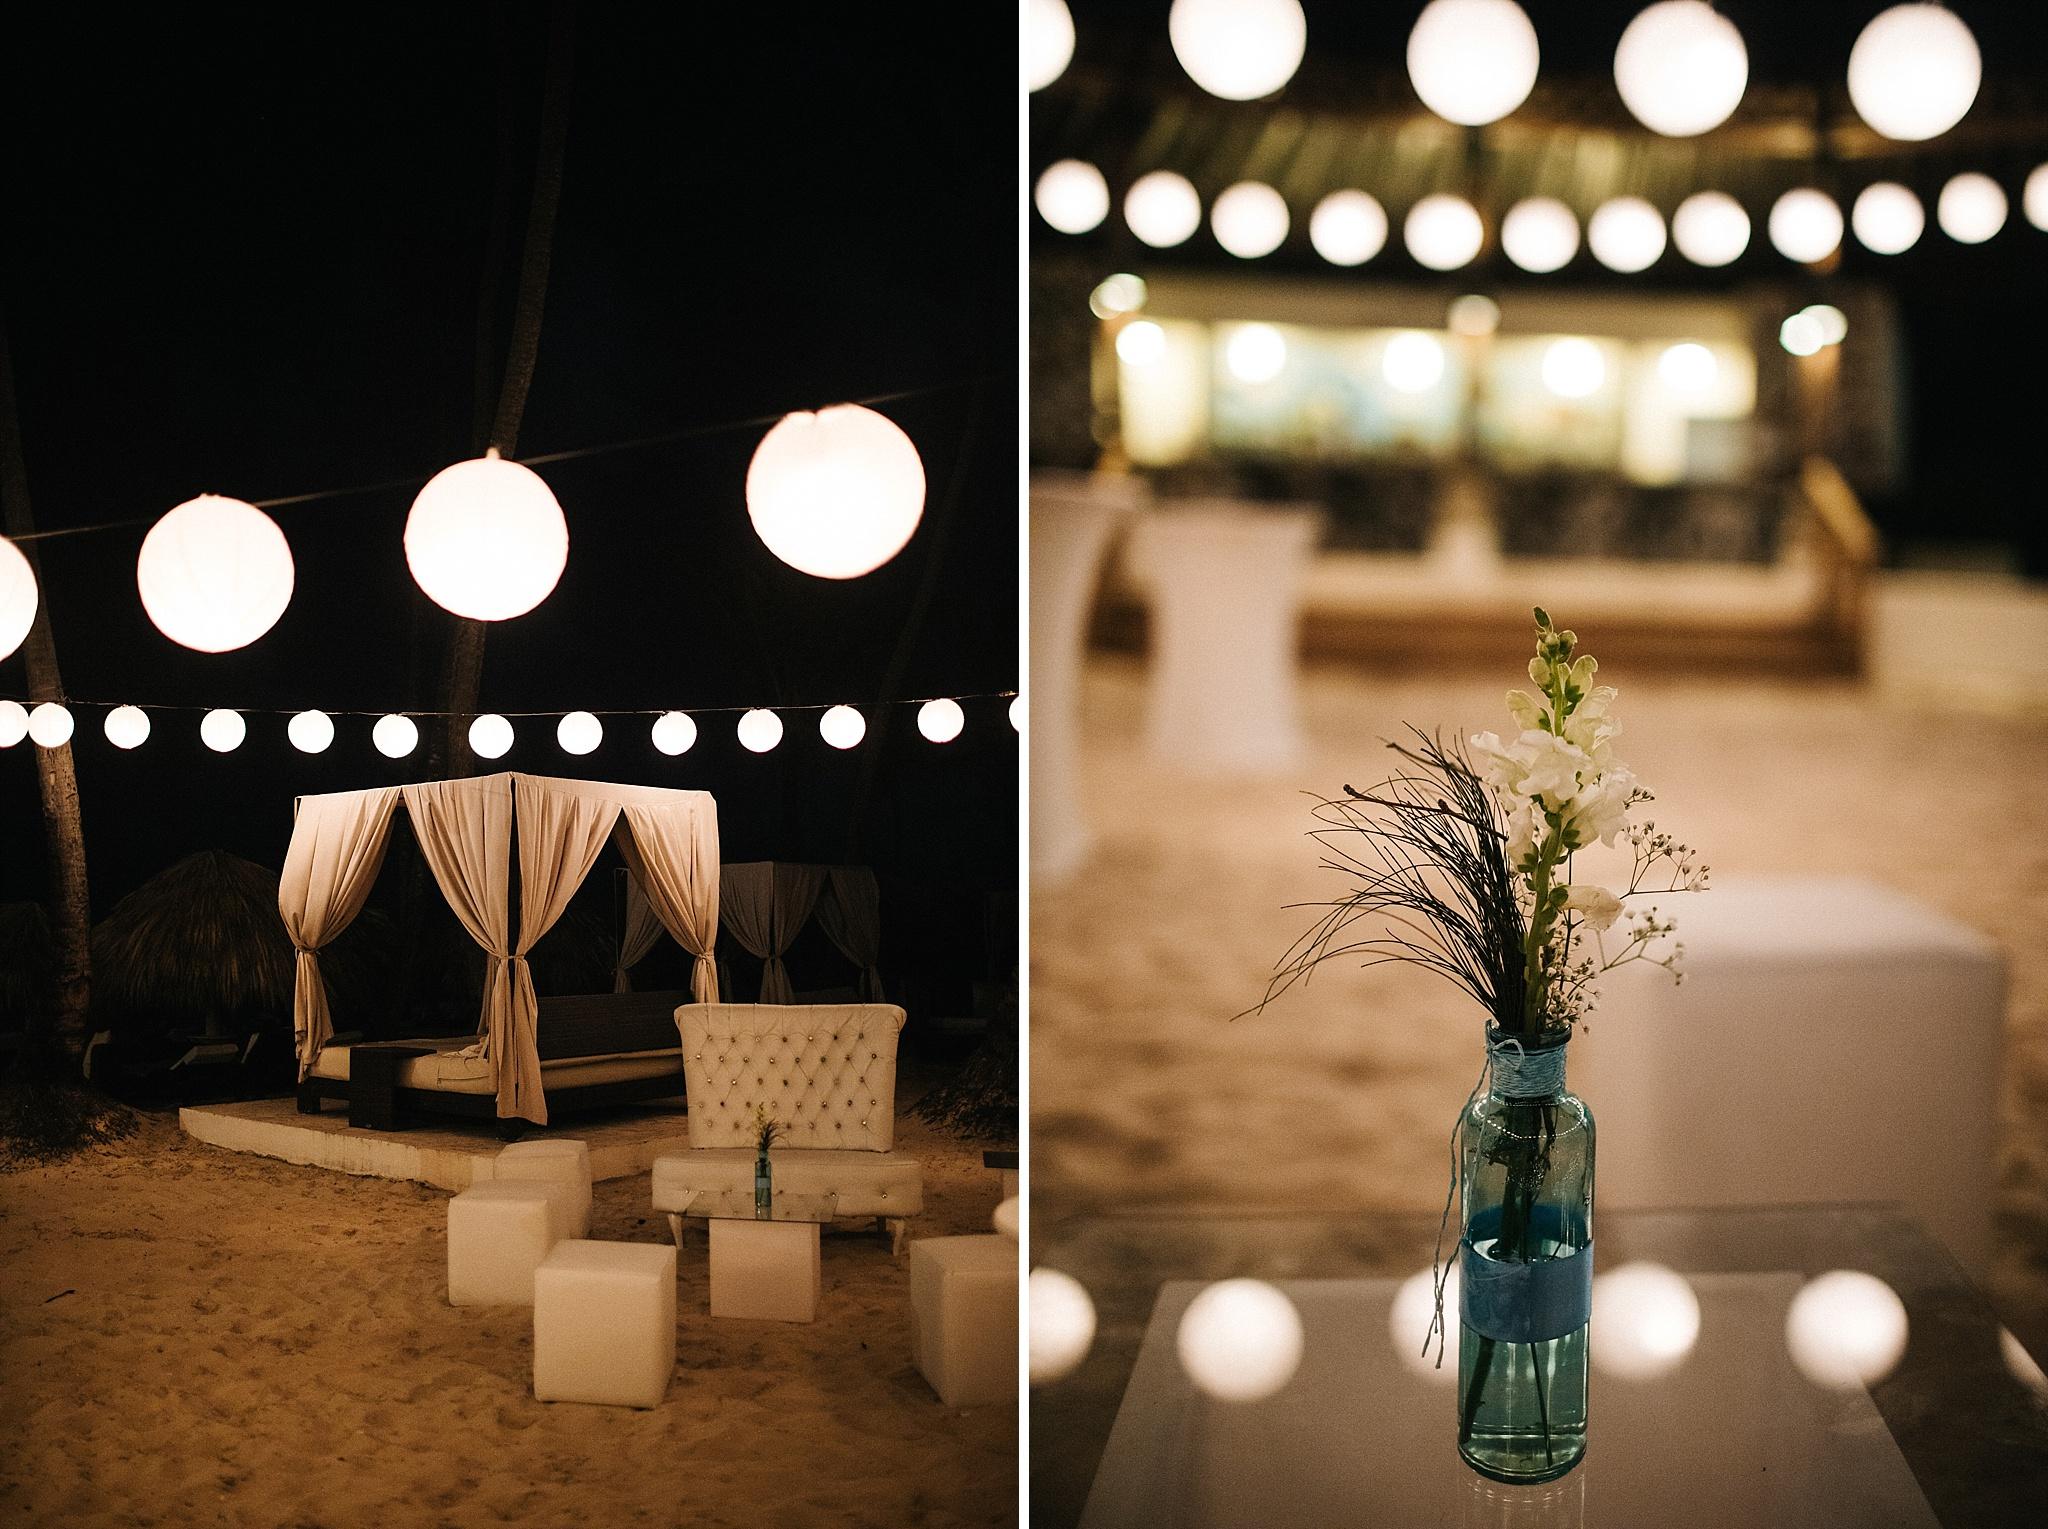 Royalton Punta Cana, Destination wedding Details